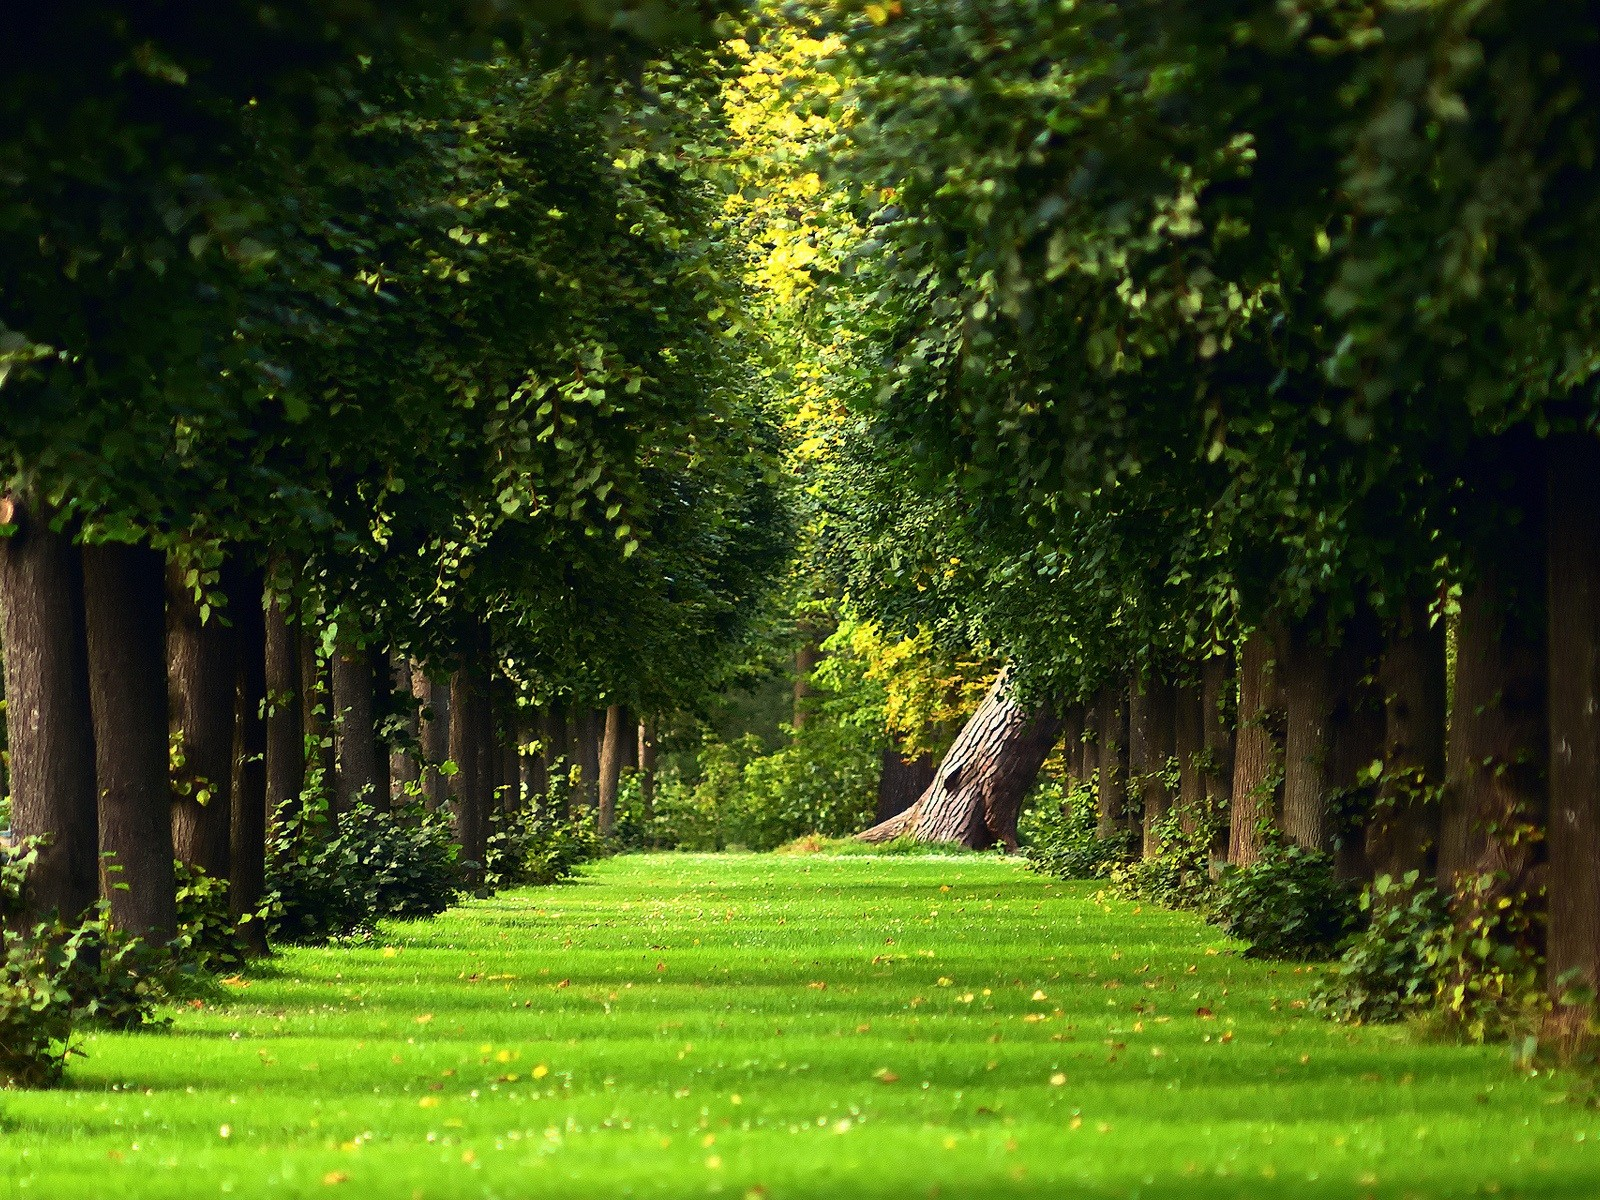 Download Beautiful Green Garden Wallpaper Full HD Wallpapers 1600x1200